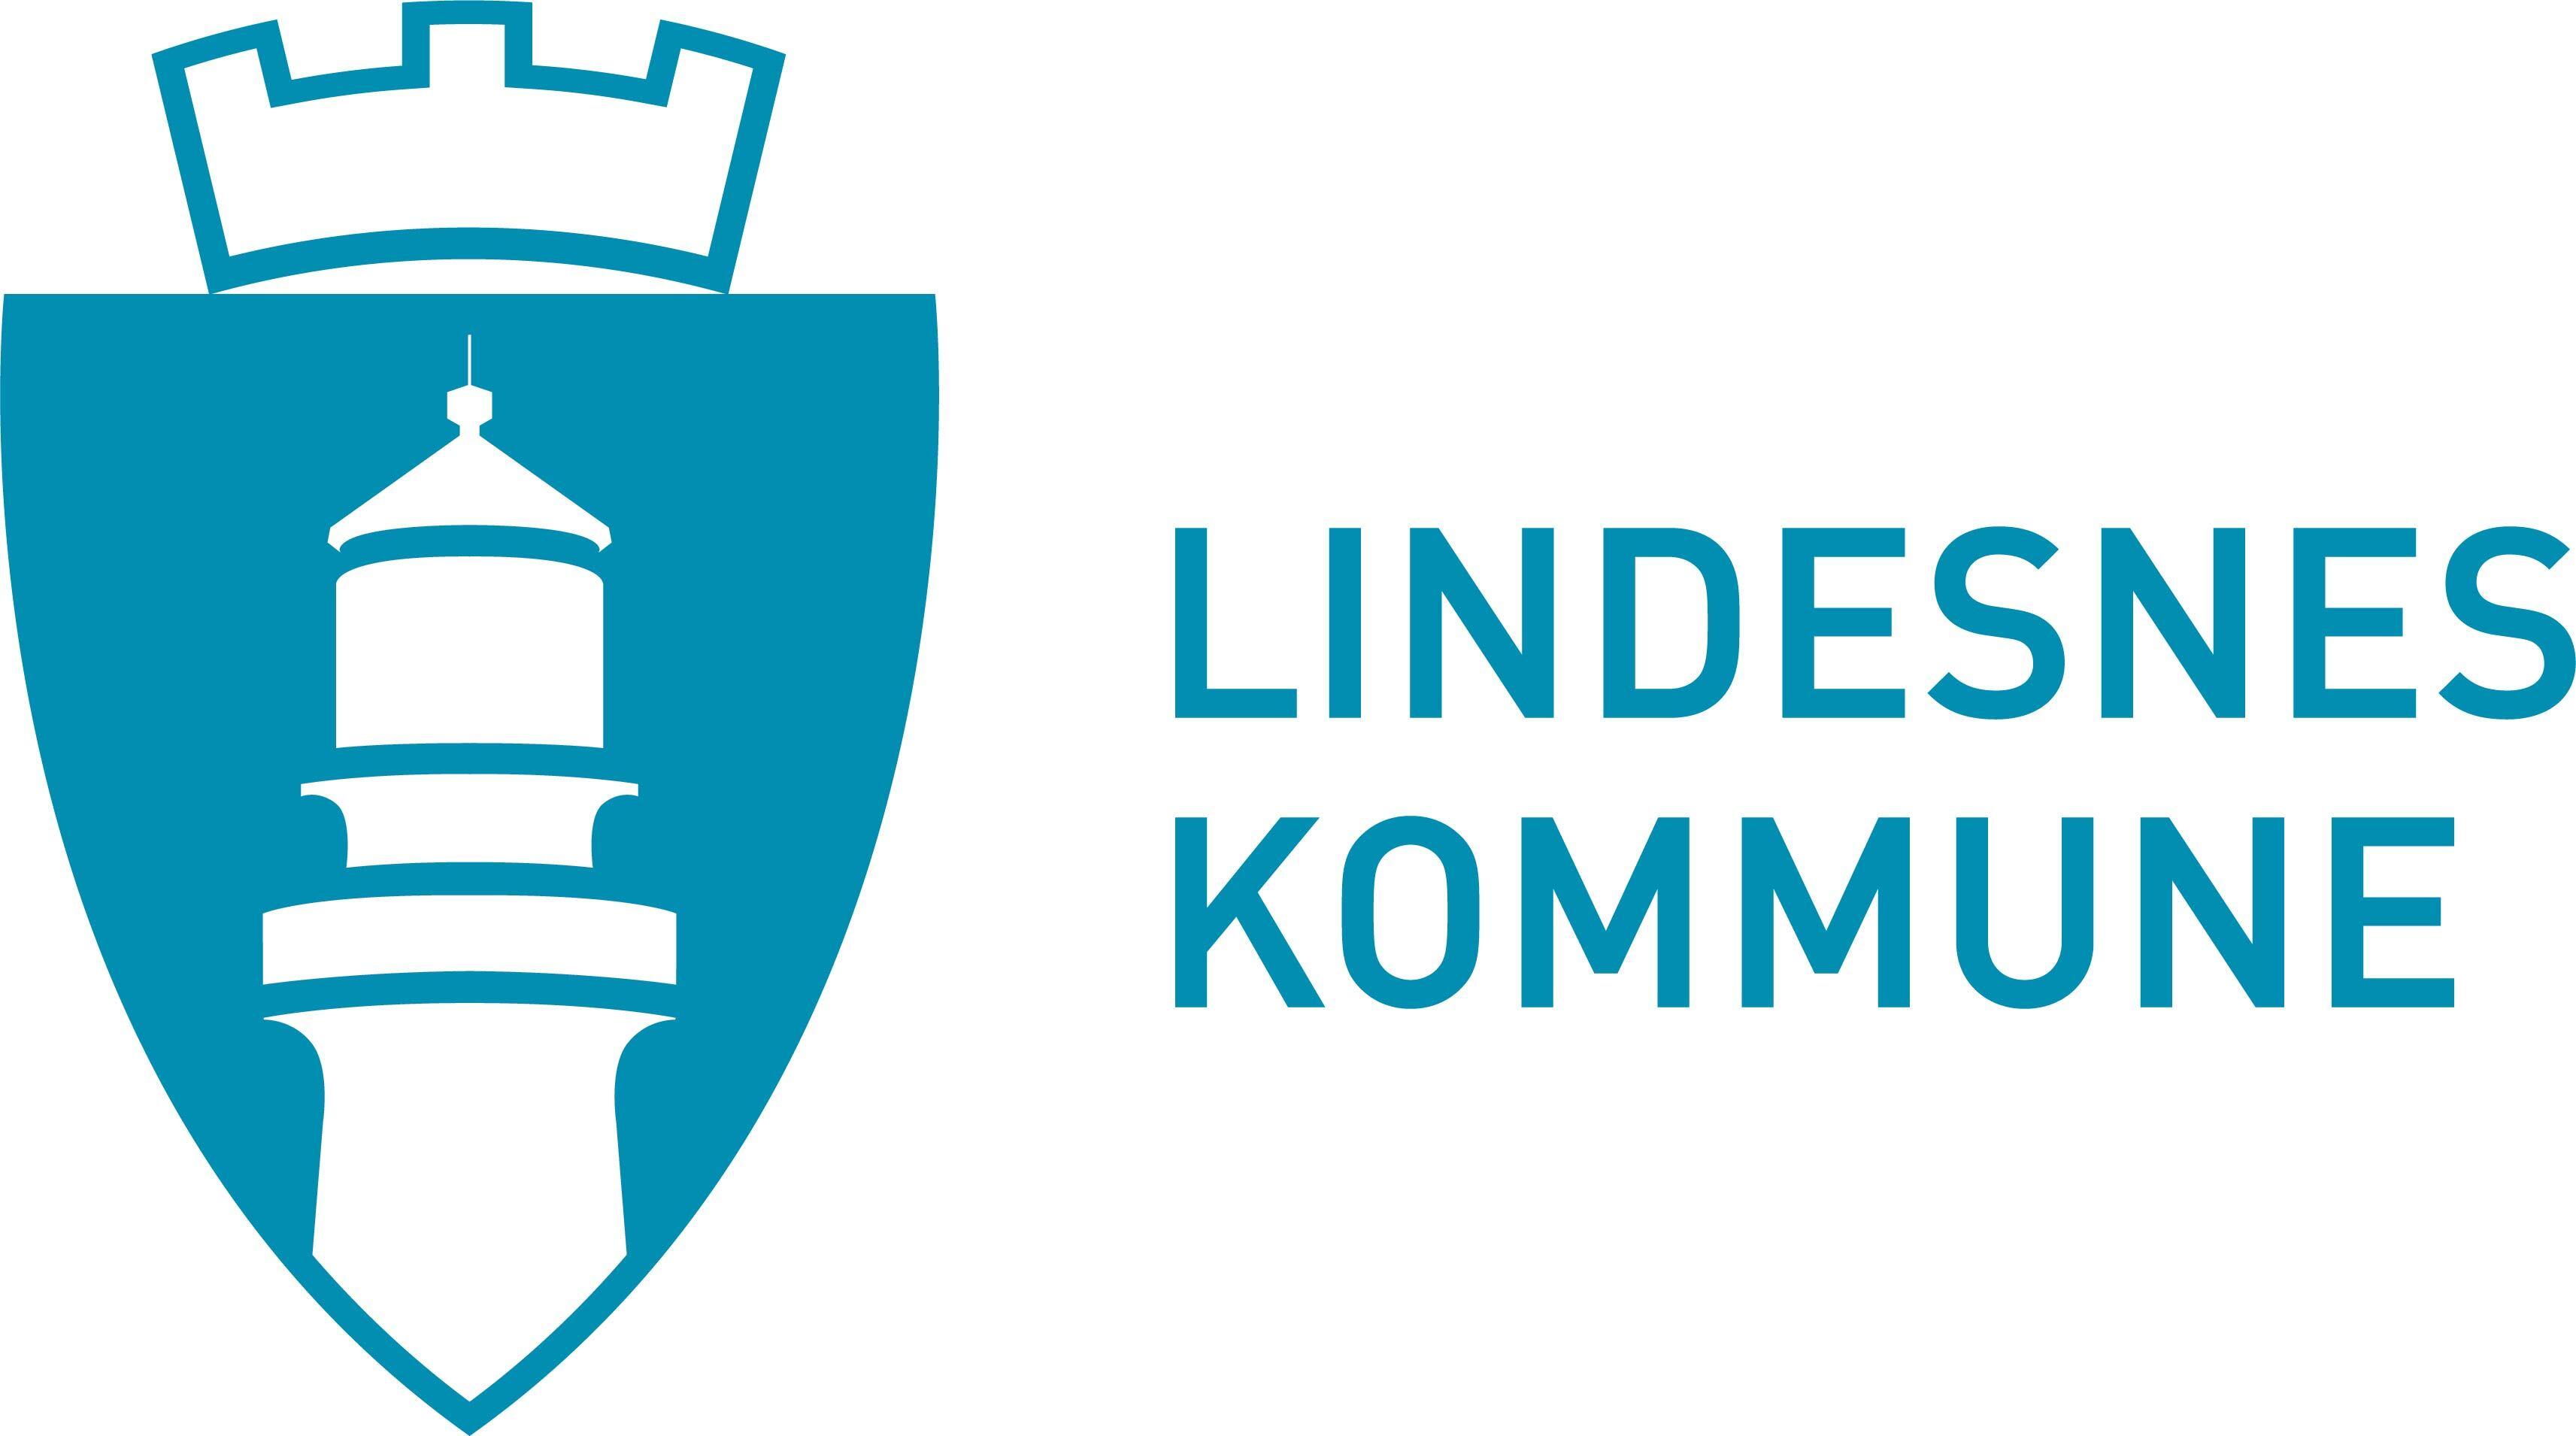 Lindesnes Kommune logo